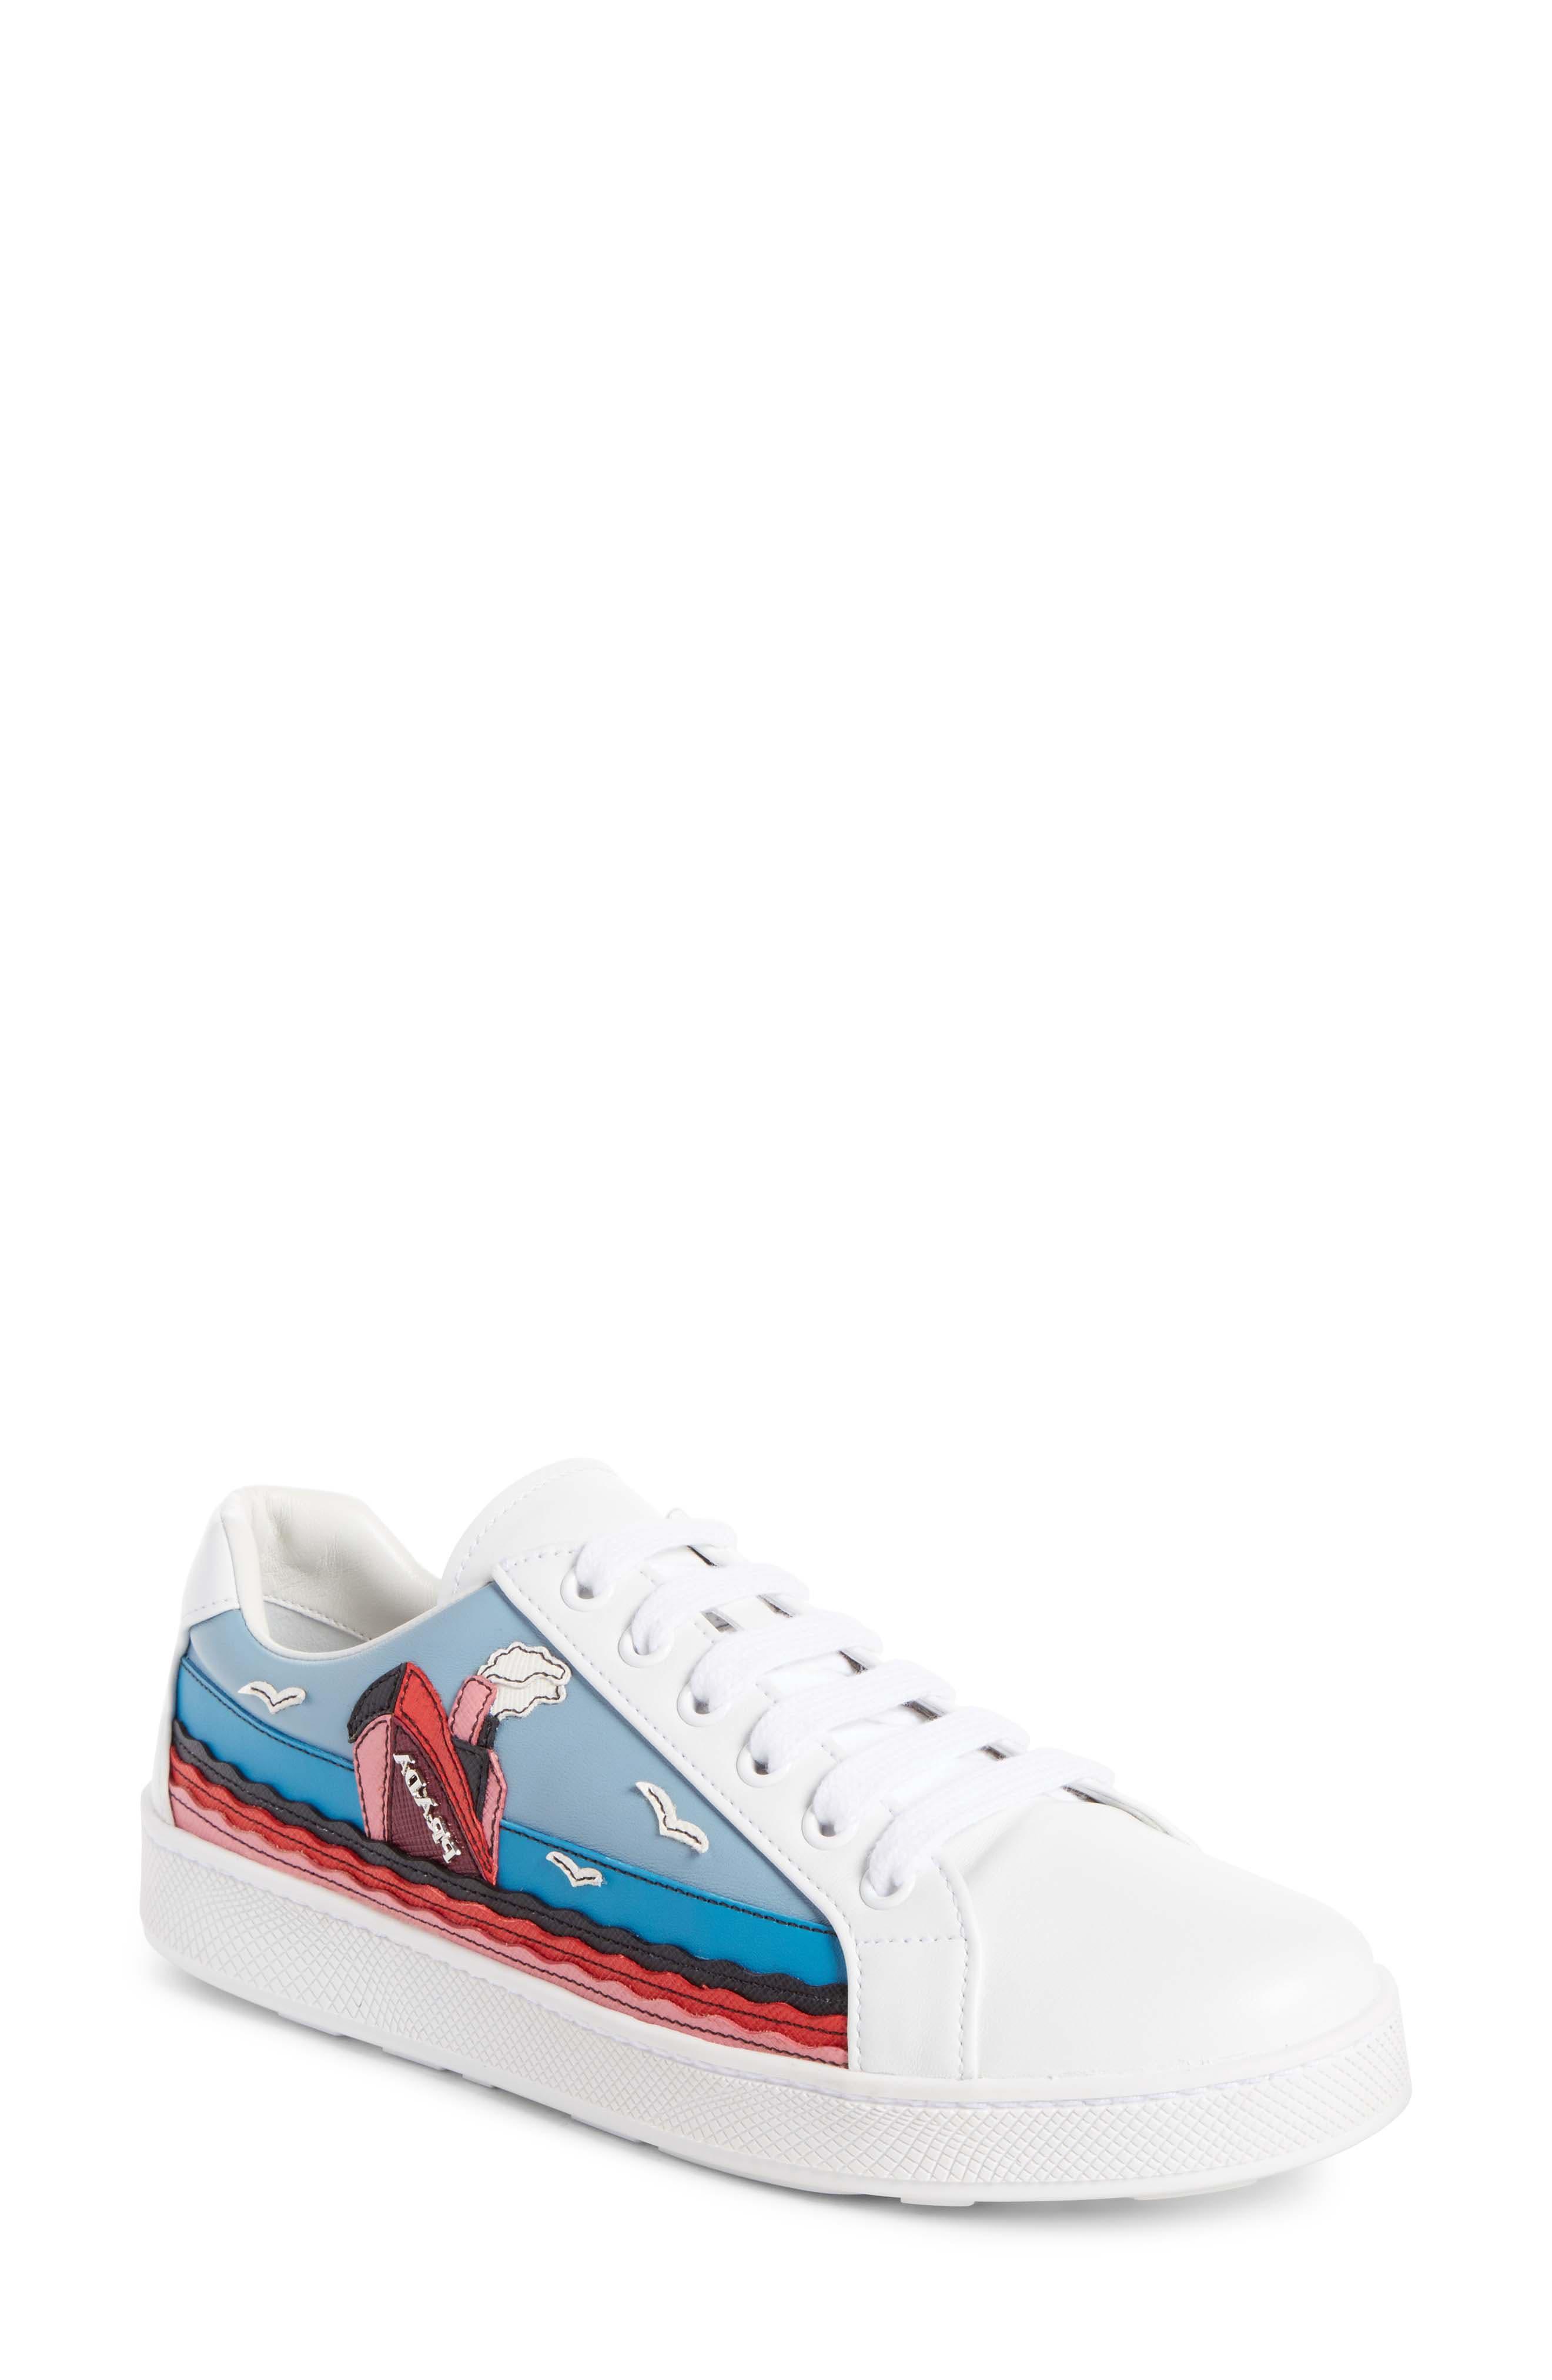 Boat Platform Lace-Up Sneaker,                             Main thumbnail 1, color,                             White